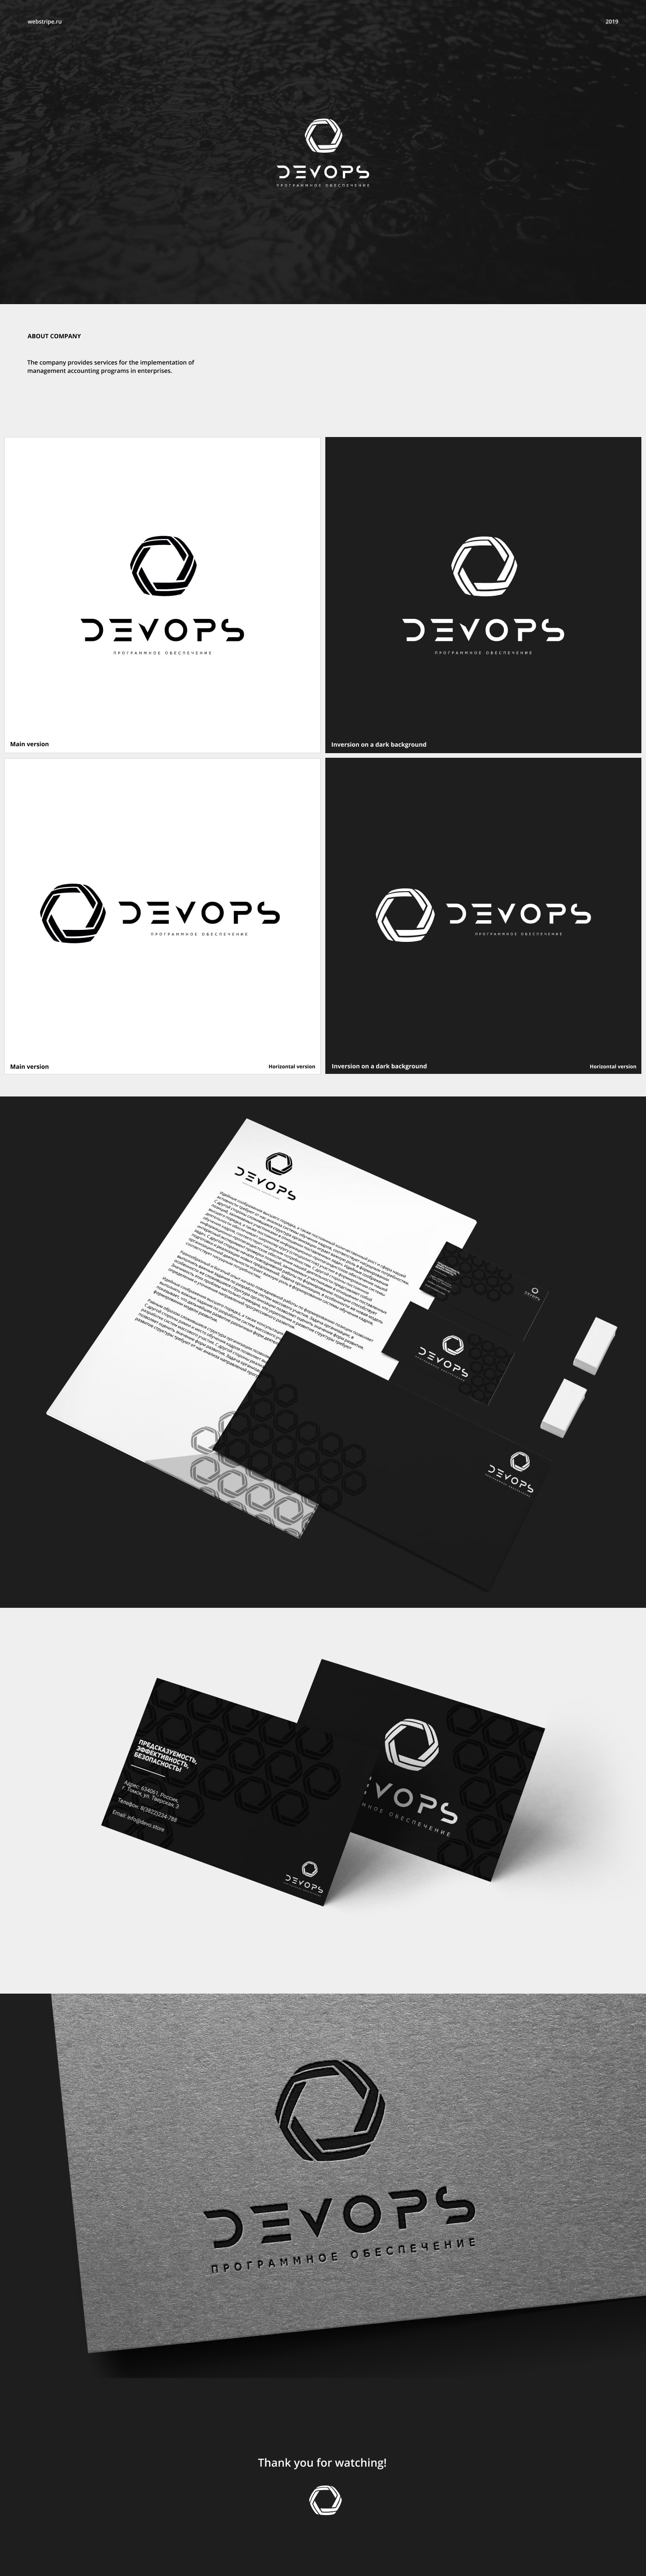 Image may contain: screenshot, print and template